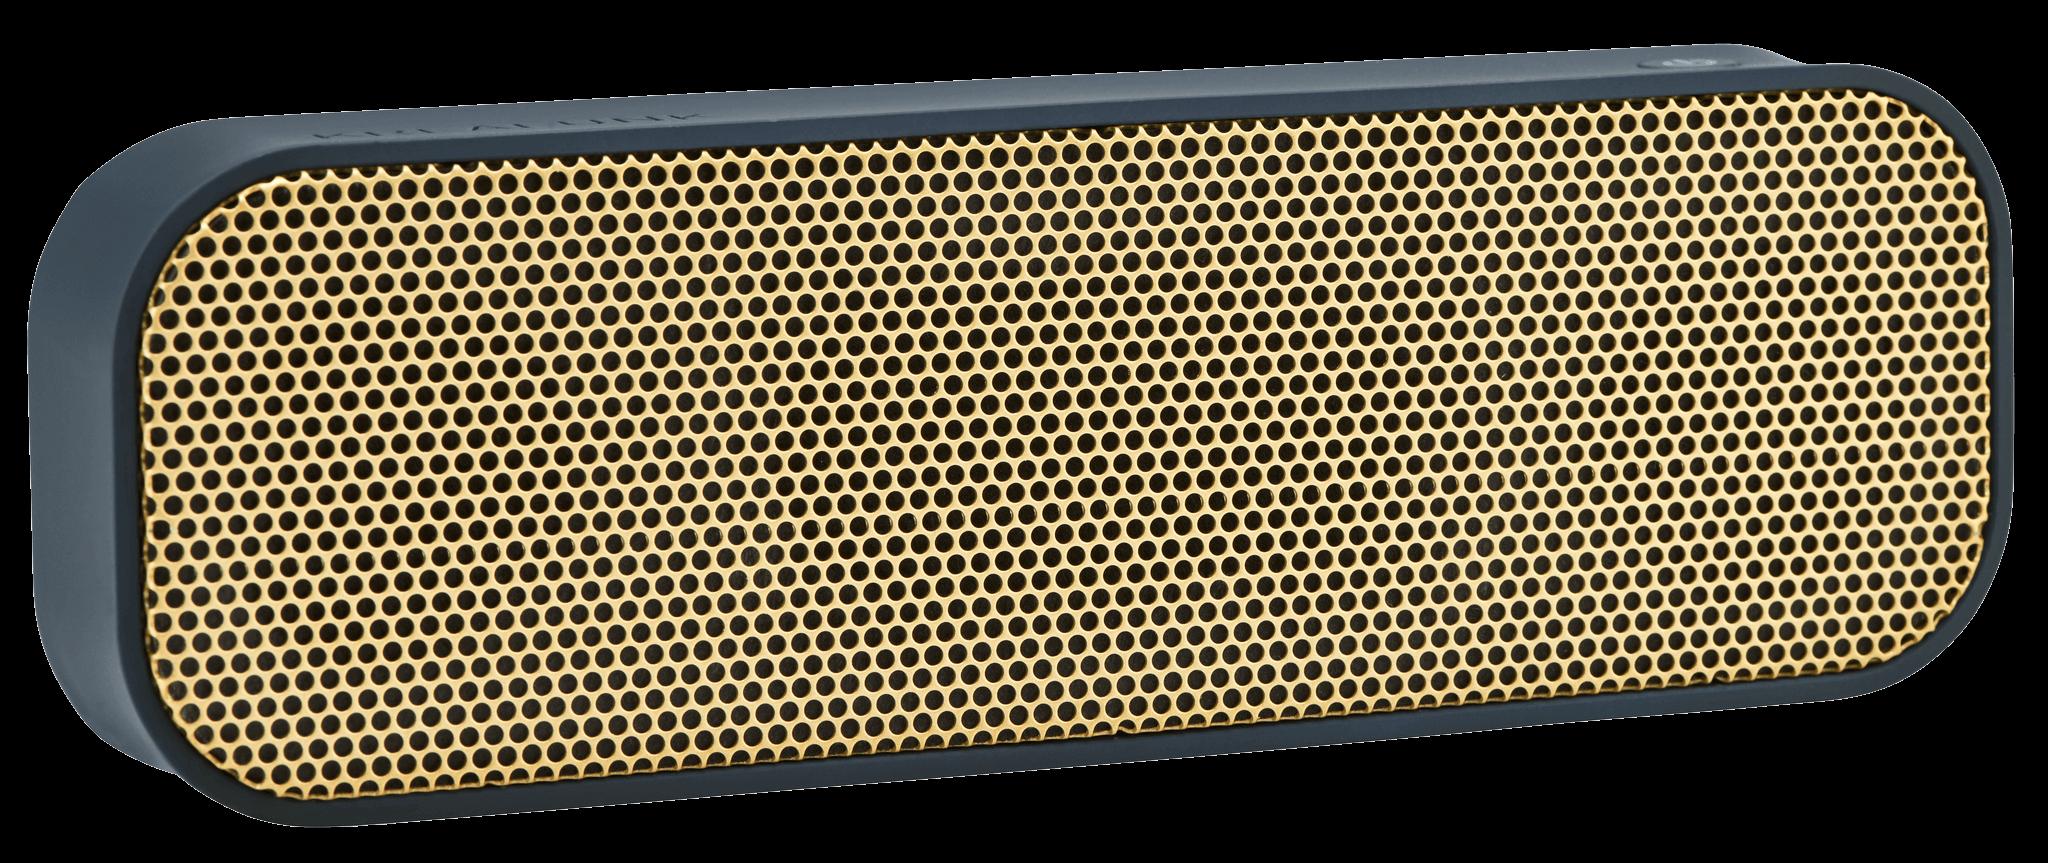 Kreafunk aGROOVE, m. guld front, Bluetooth 3.0. flera färger Blå